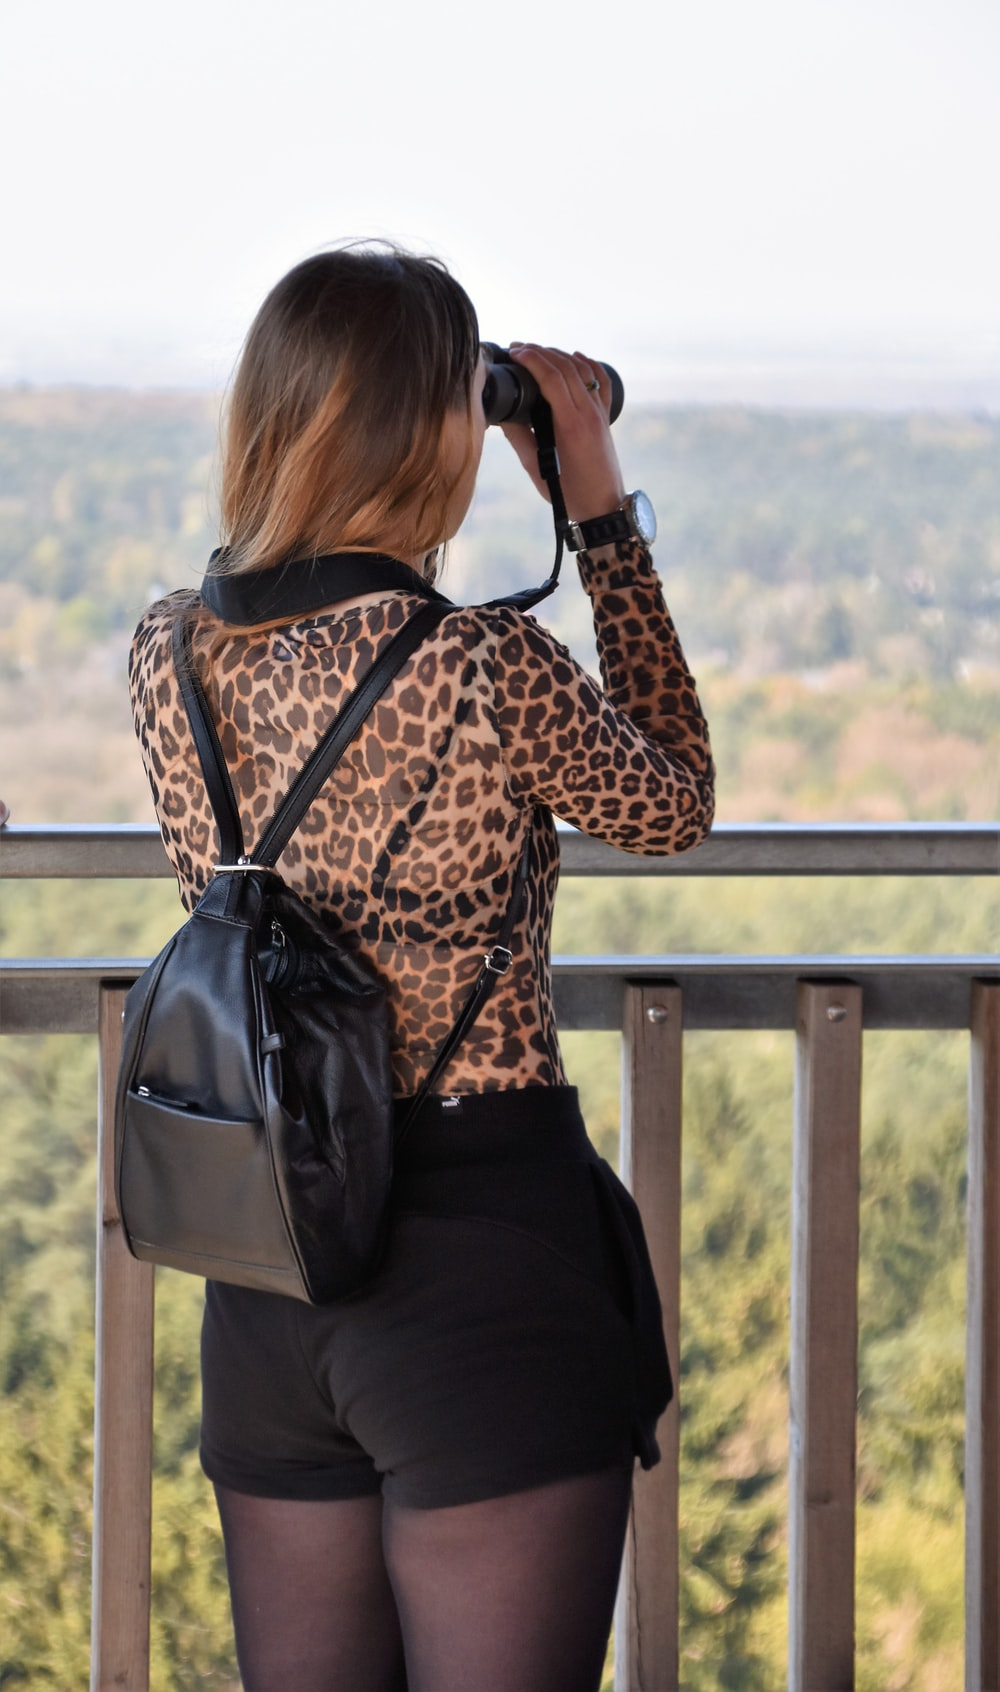 woman looking on binoculars